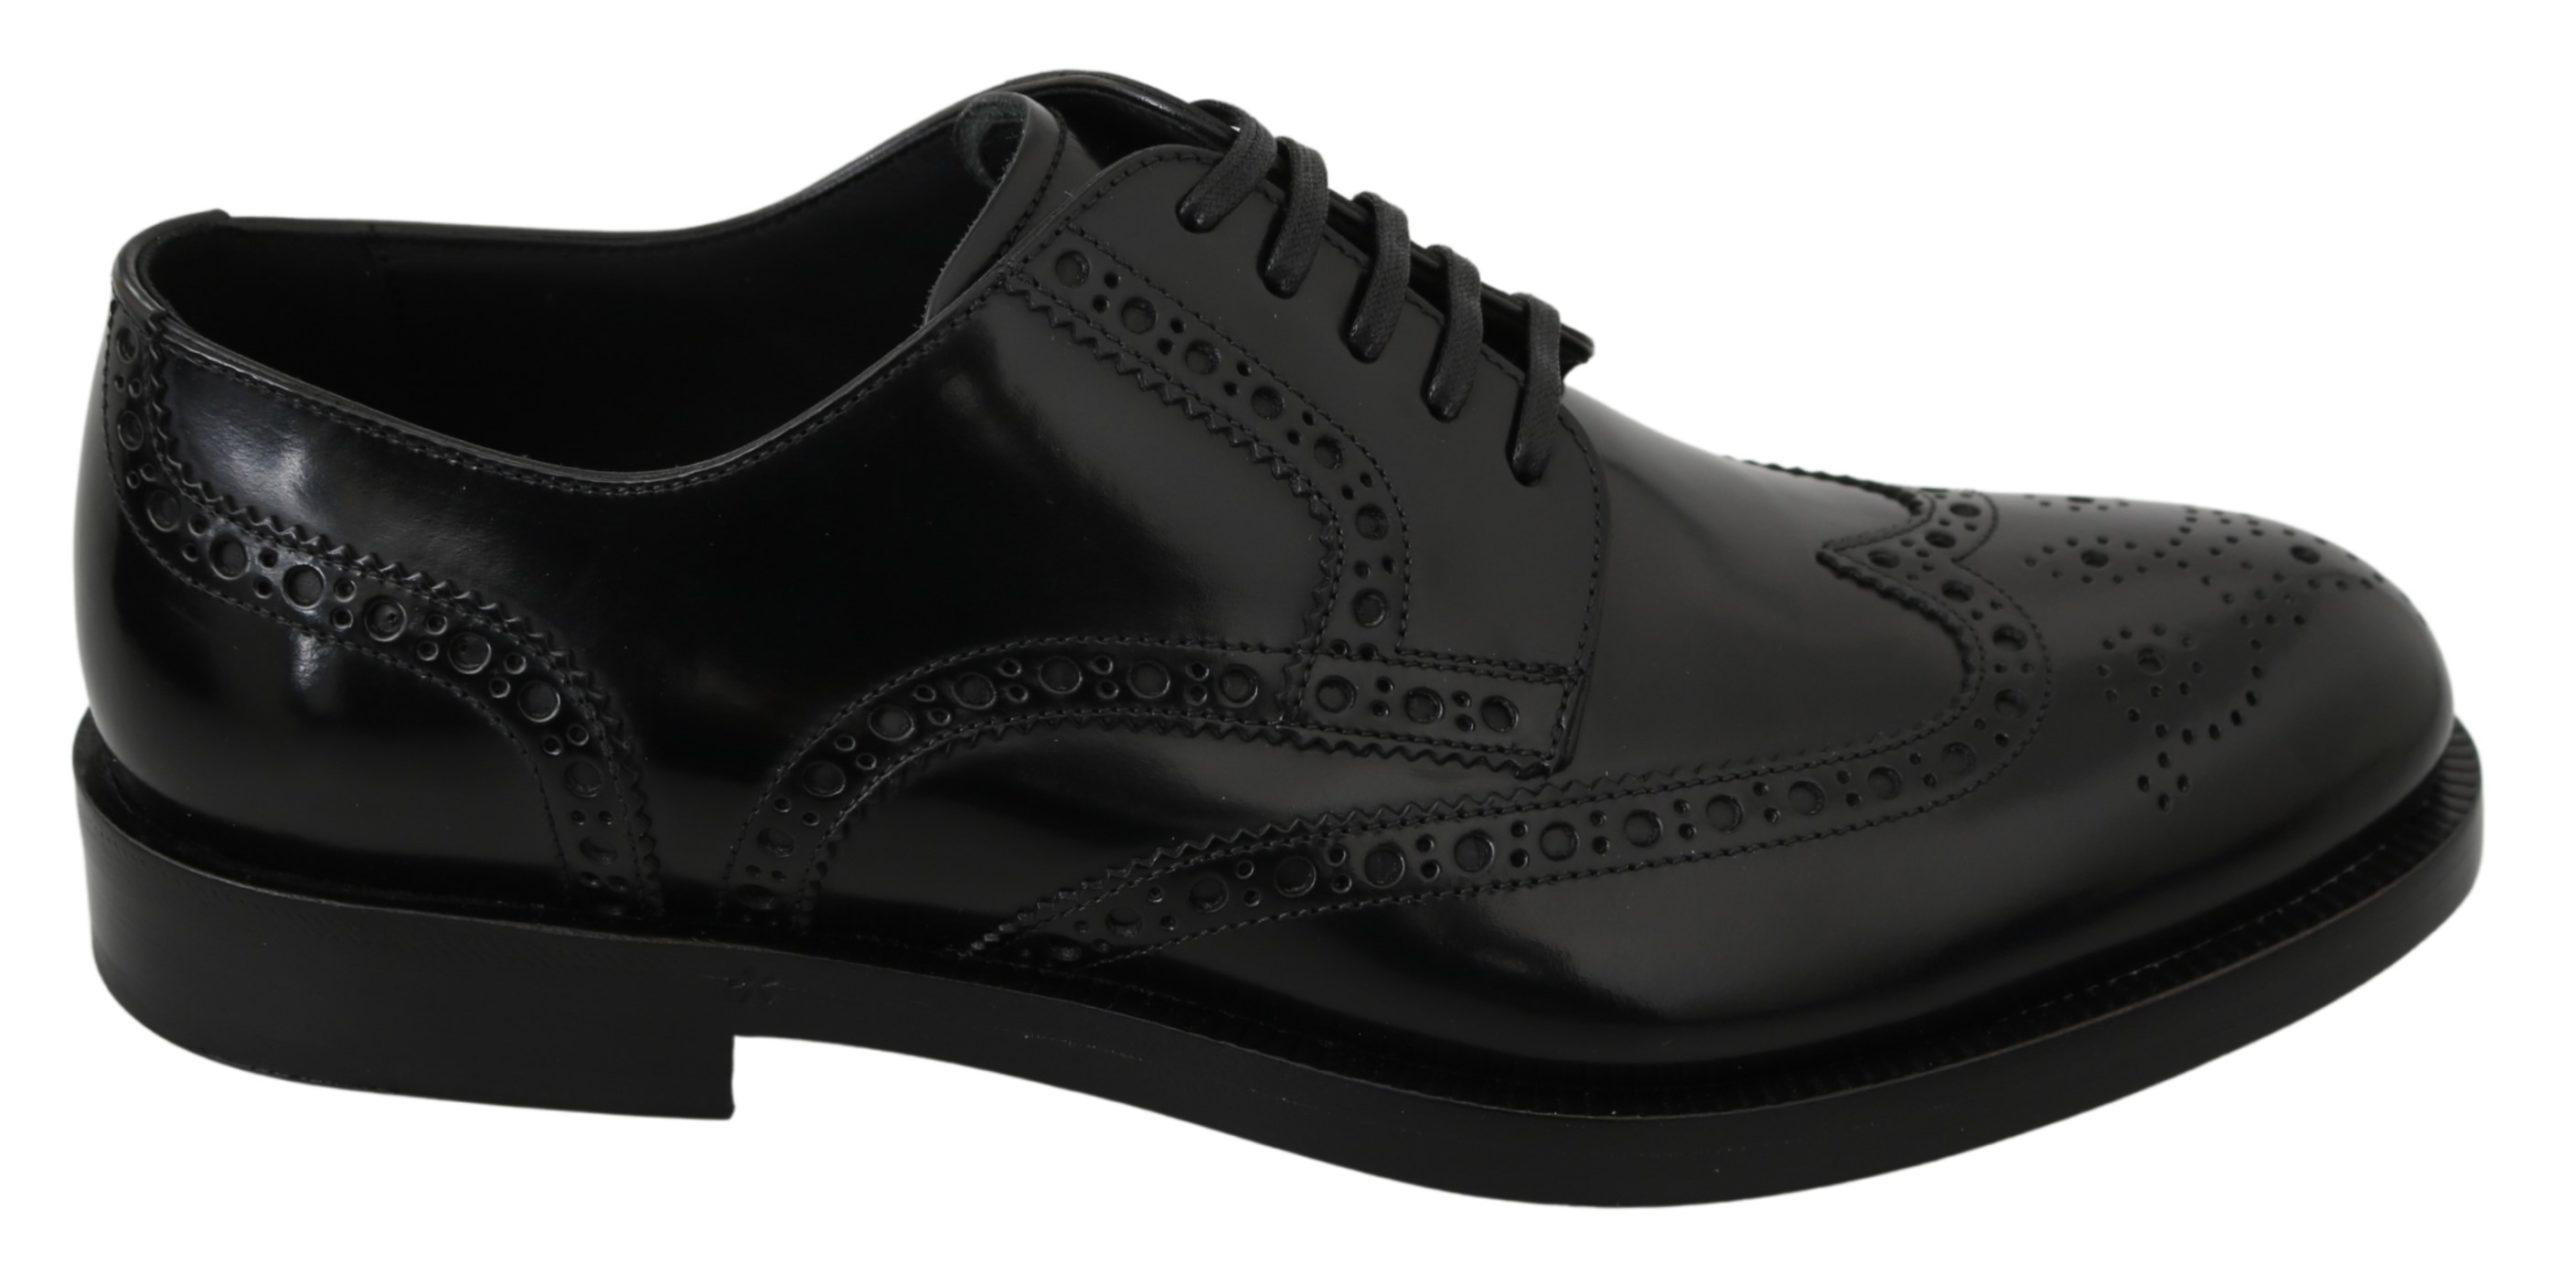 Dolce & Gabbana Men's Leather Formal Brogue Shoe Black MV2894 - EU40.5/US7.5